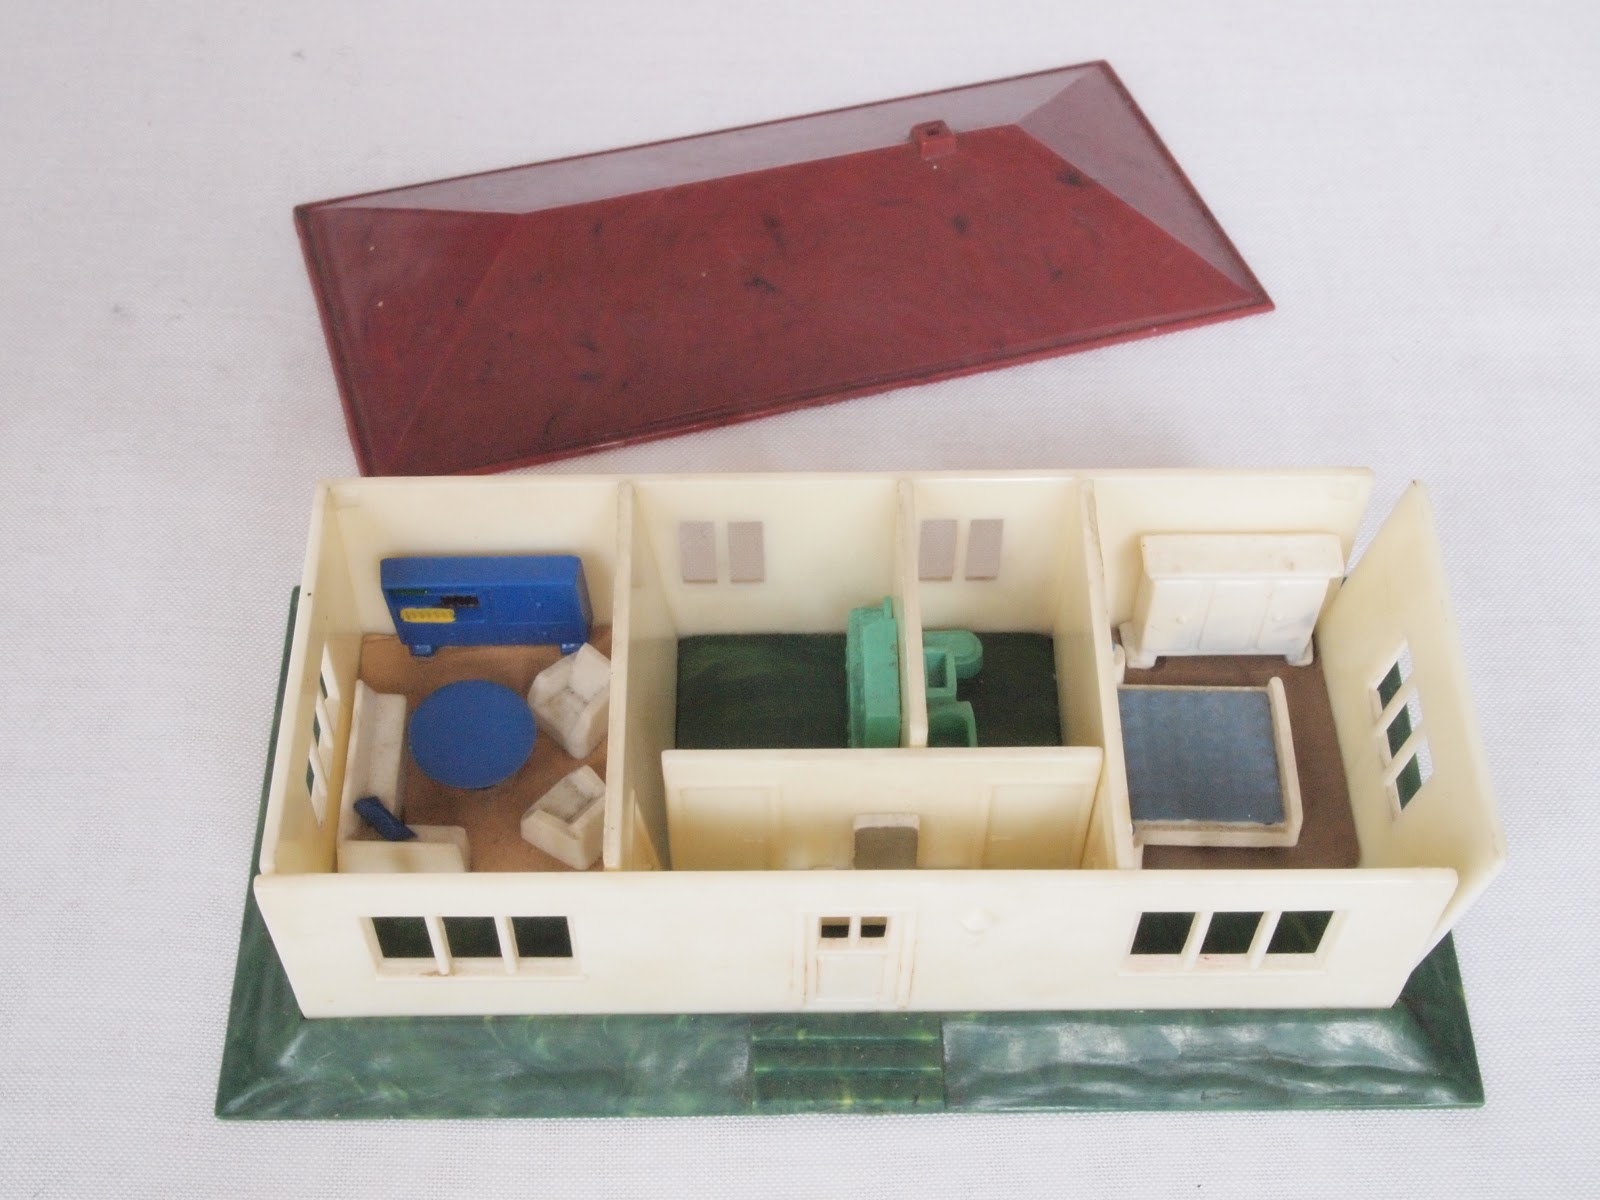 diePuppenstubensammlerin: Miniatur Haus - 1951 Wiking - Miniature house